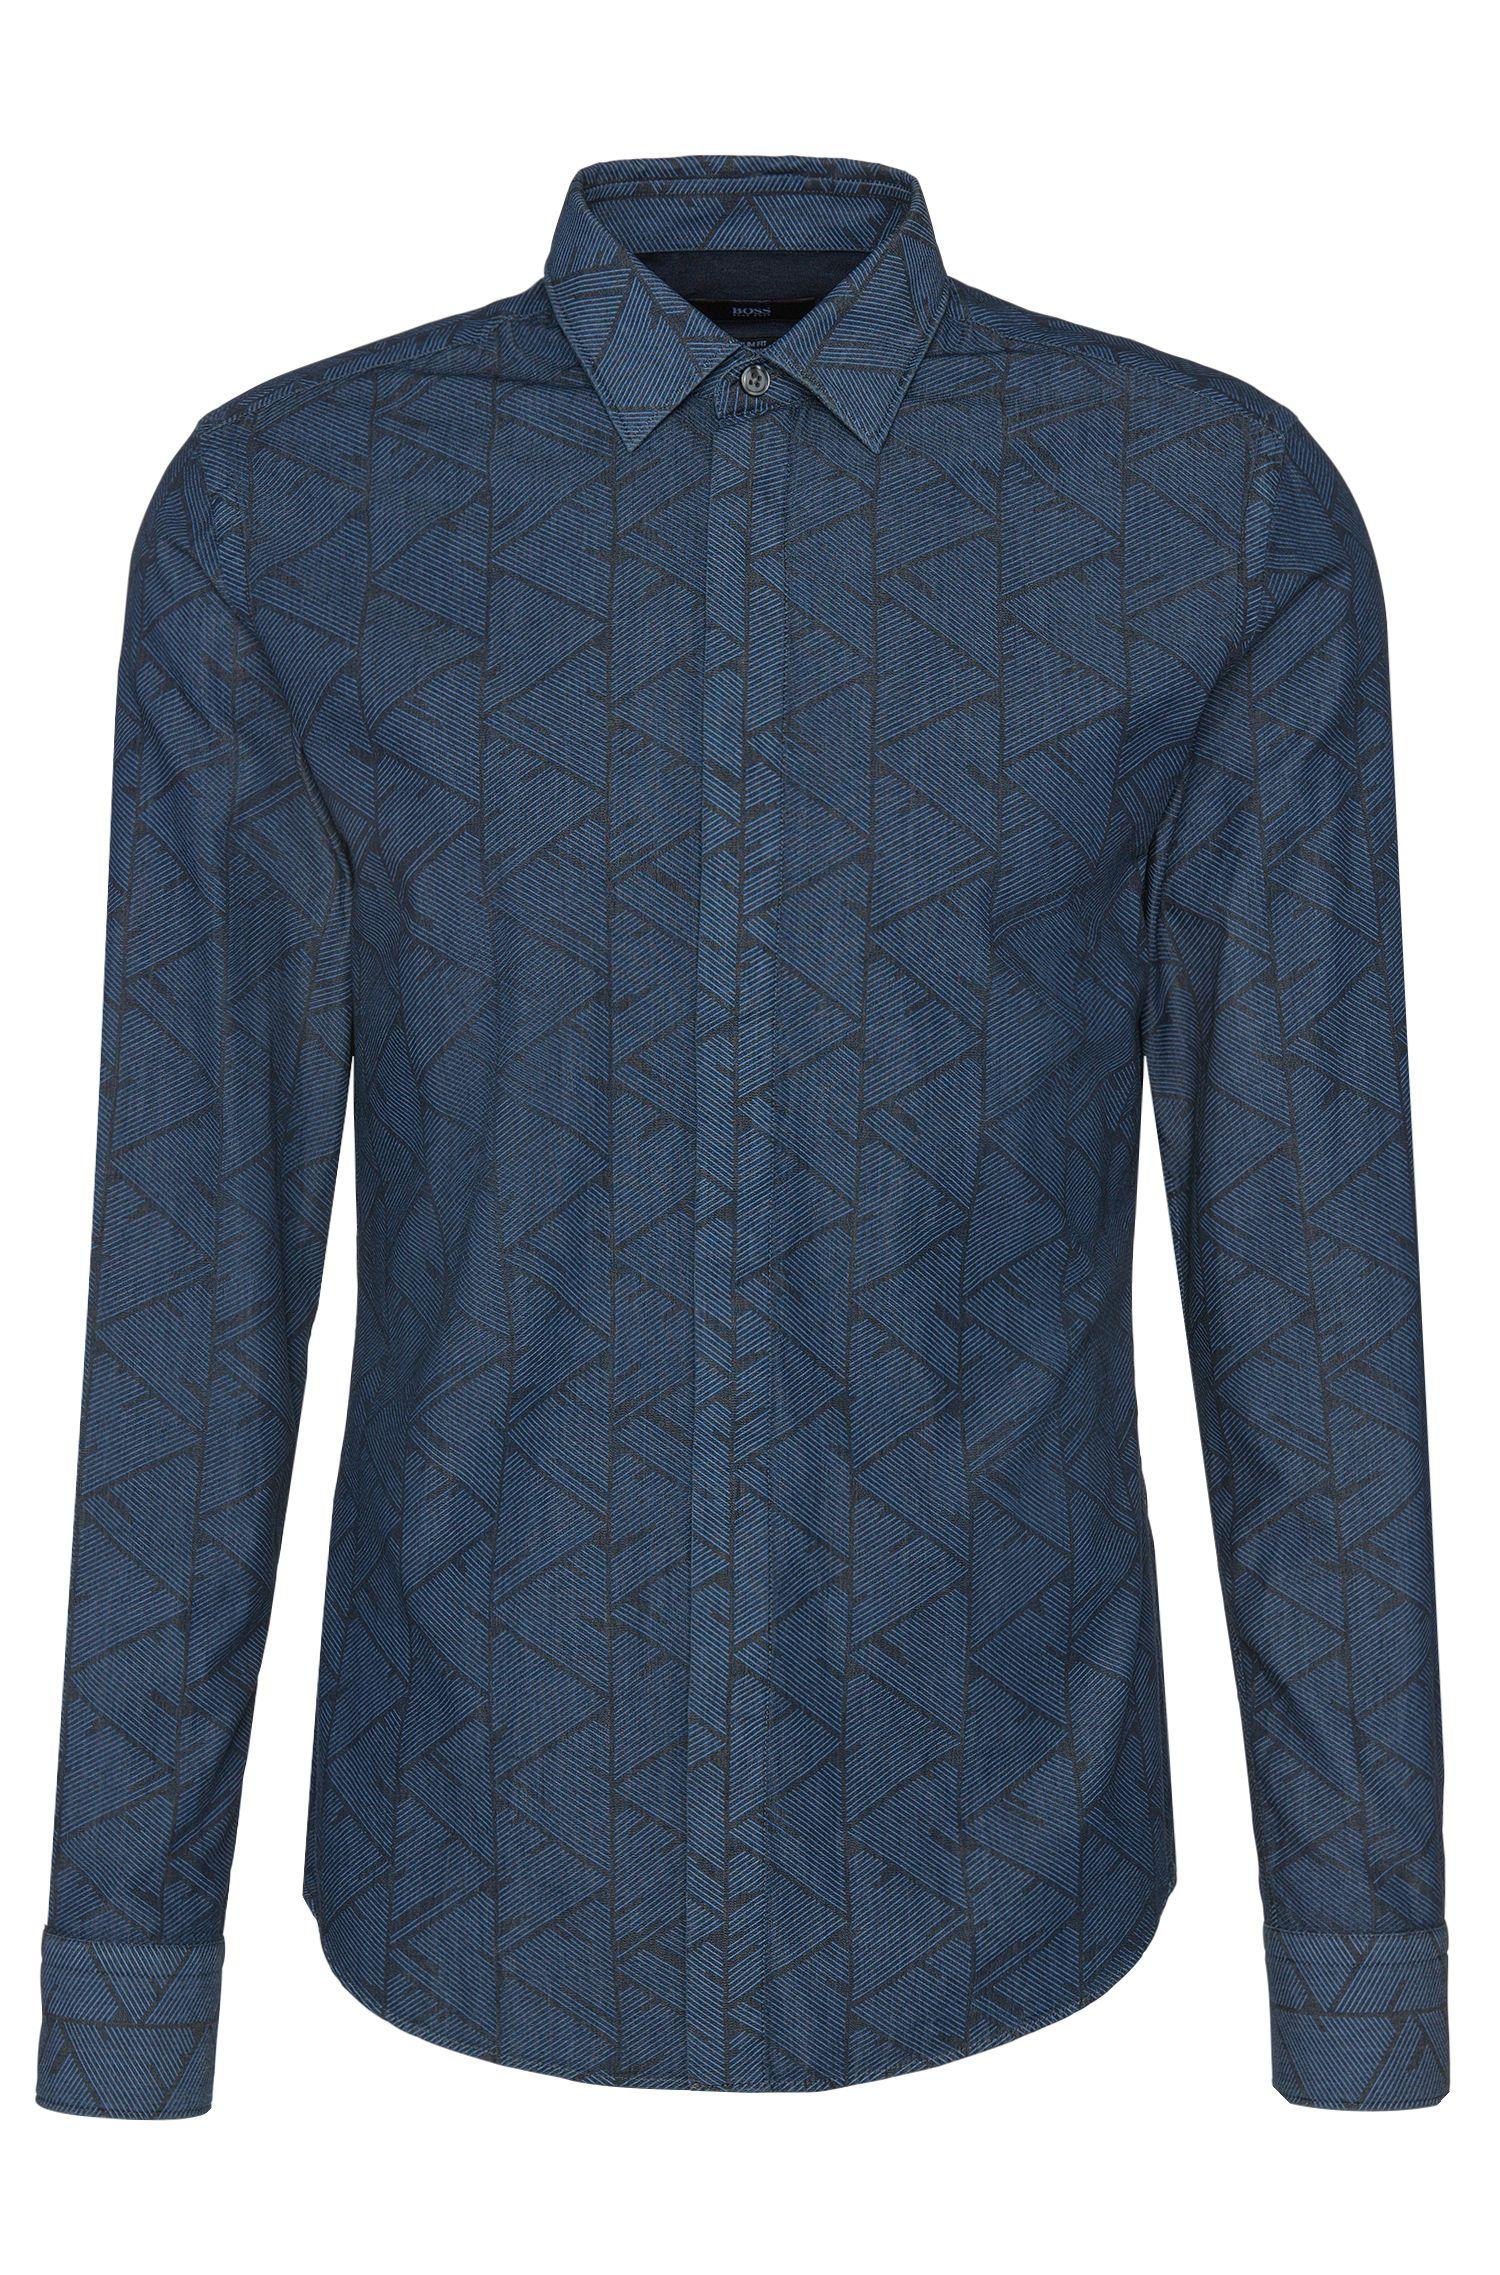 'Reid' | Slim Fit, Italian Cotton Abstract Button Down Shirt, Light Blue